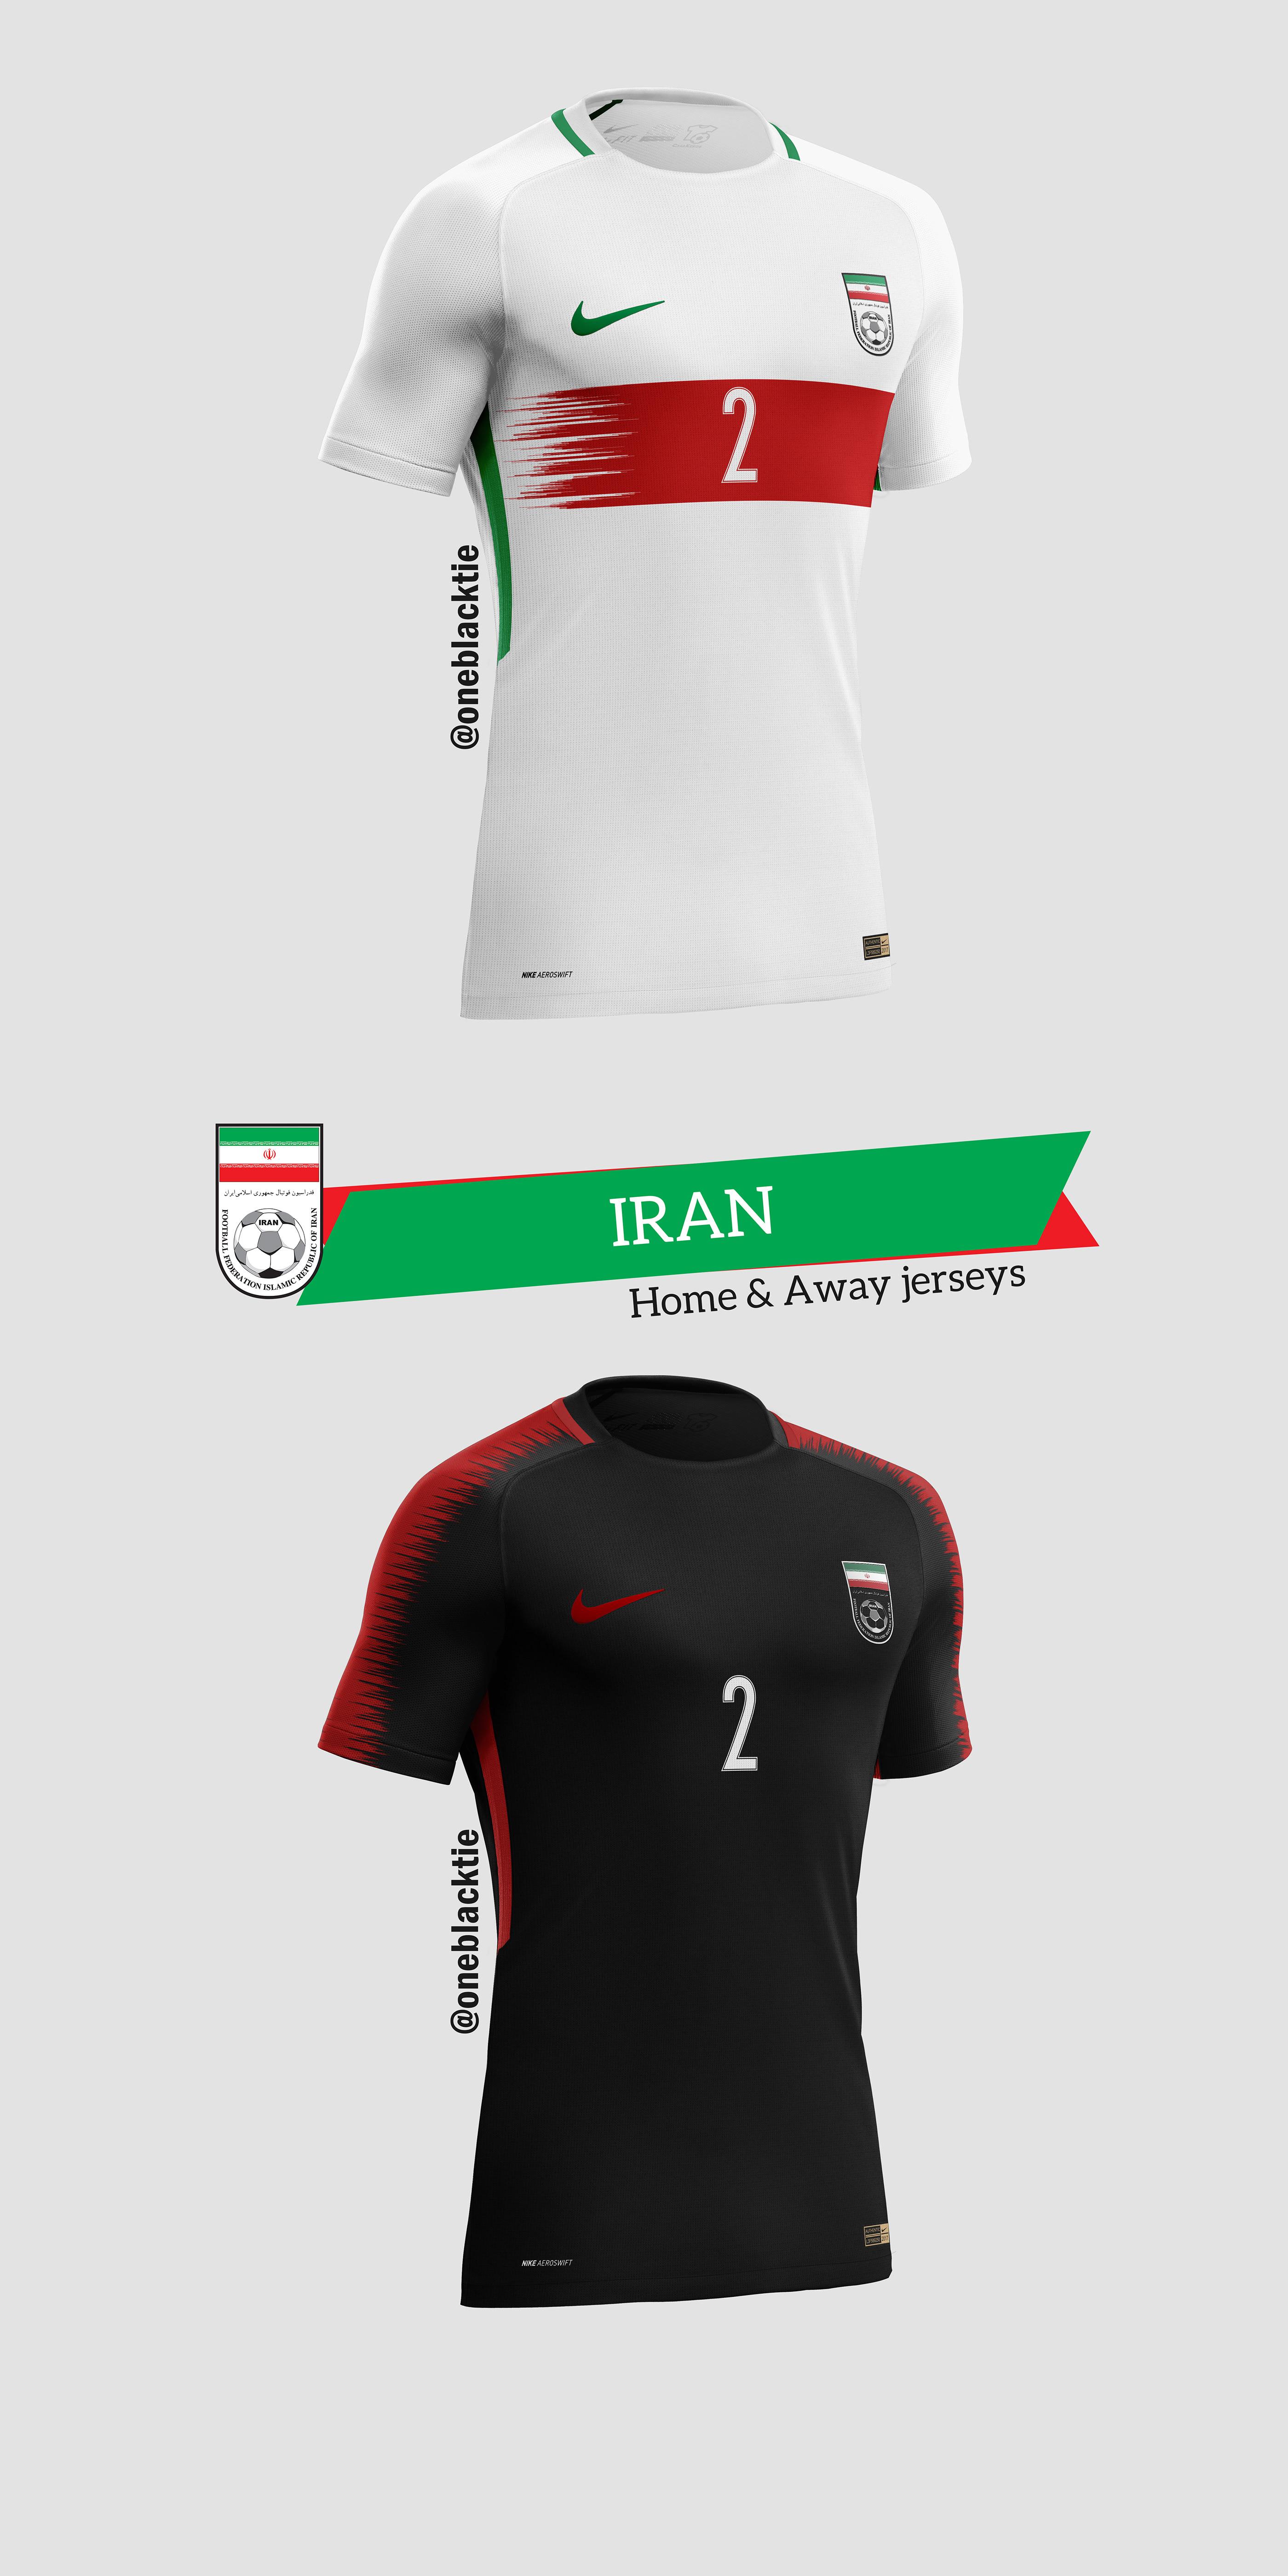 75ba7fdd7 Nike FIFA World Cup Russia 2018 Concept Jerseys on Behance